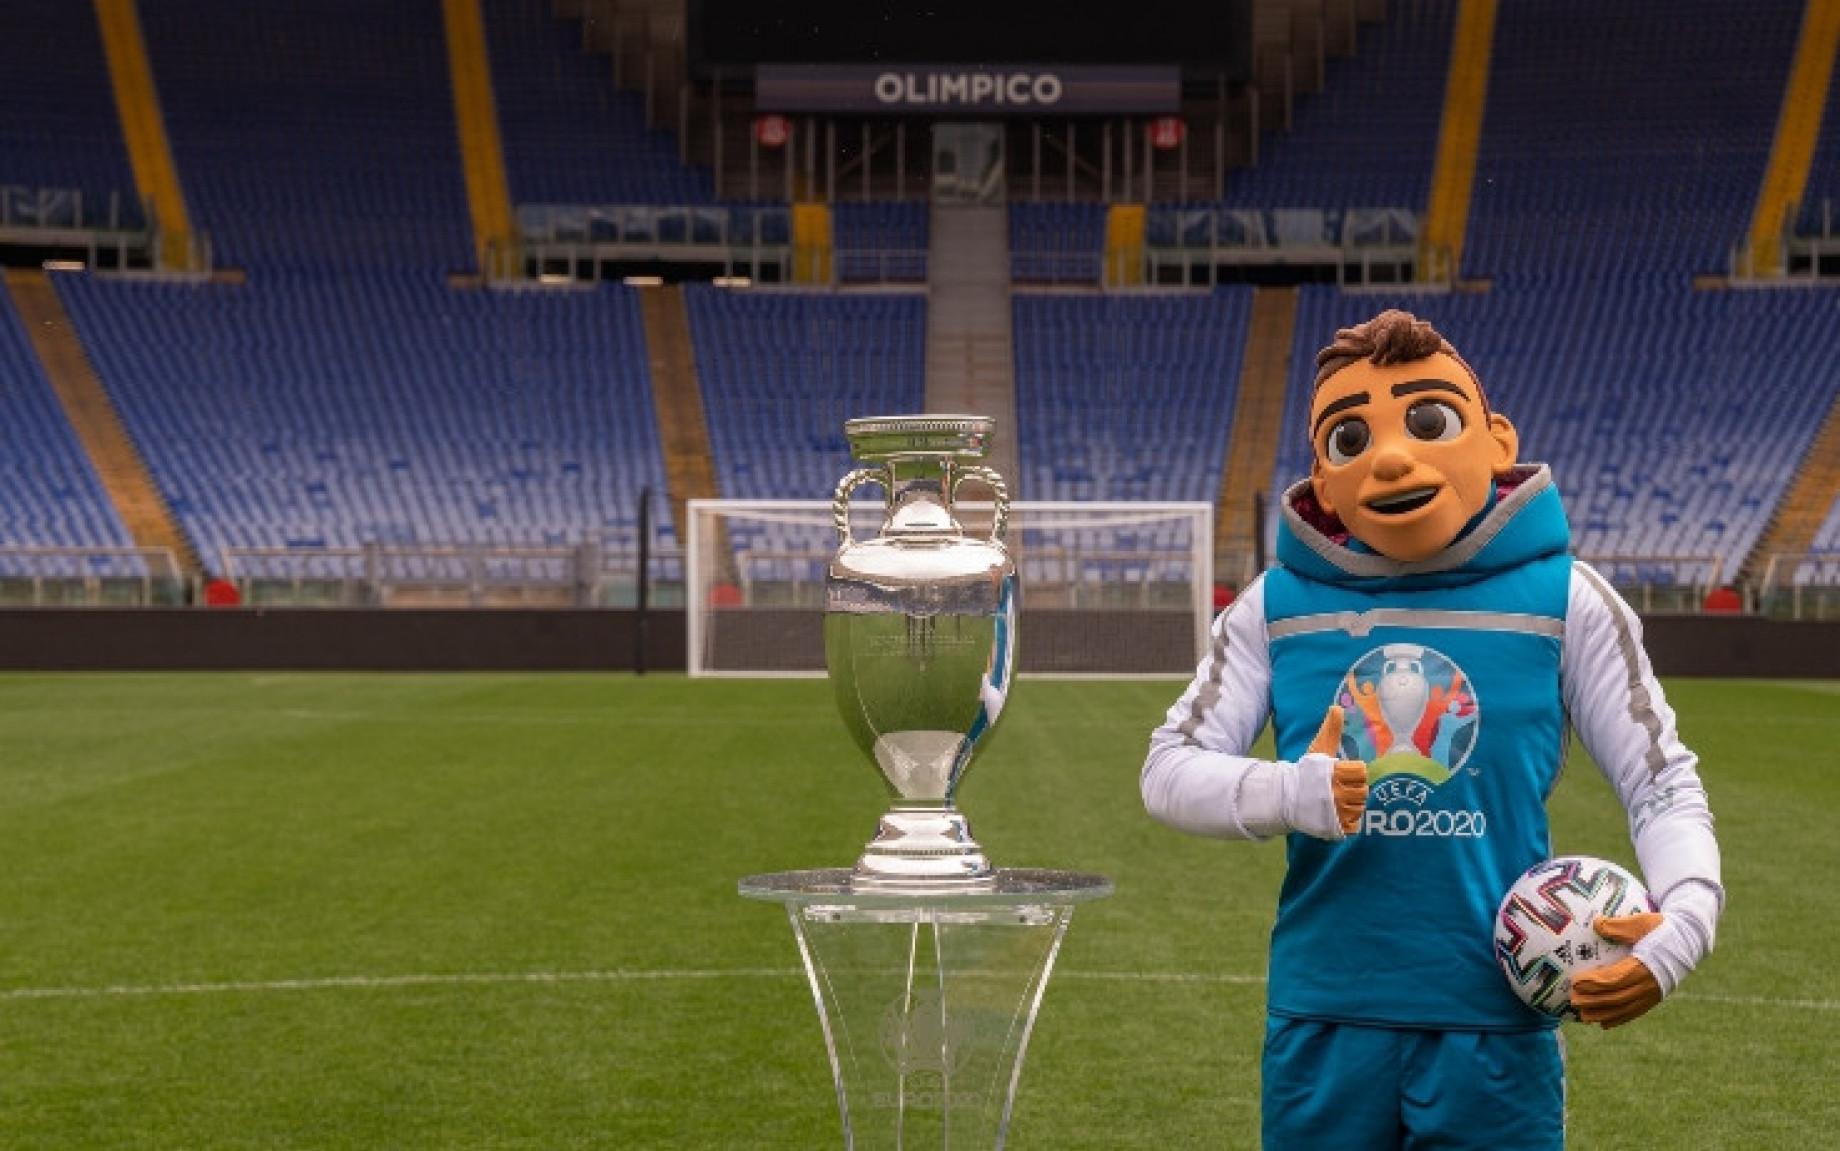 trofeo-euro-2020-olimpico-gdm.jpg